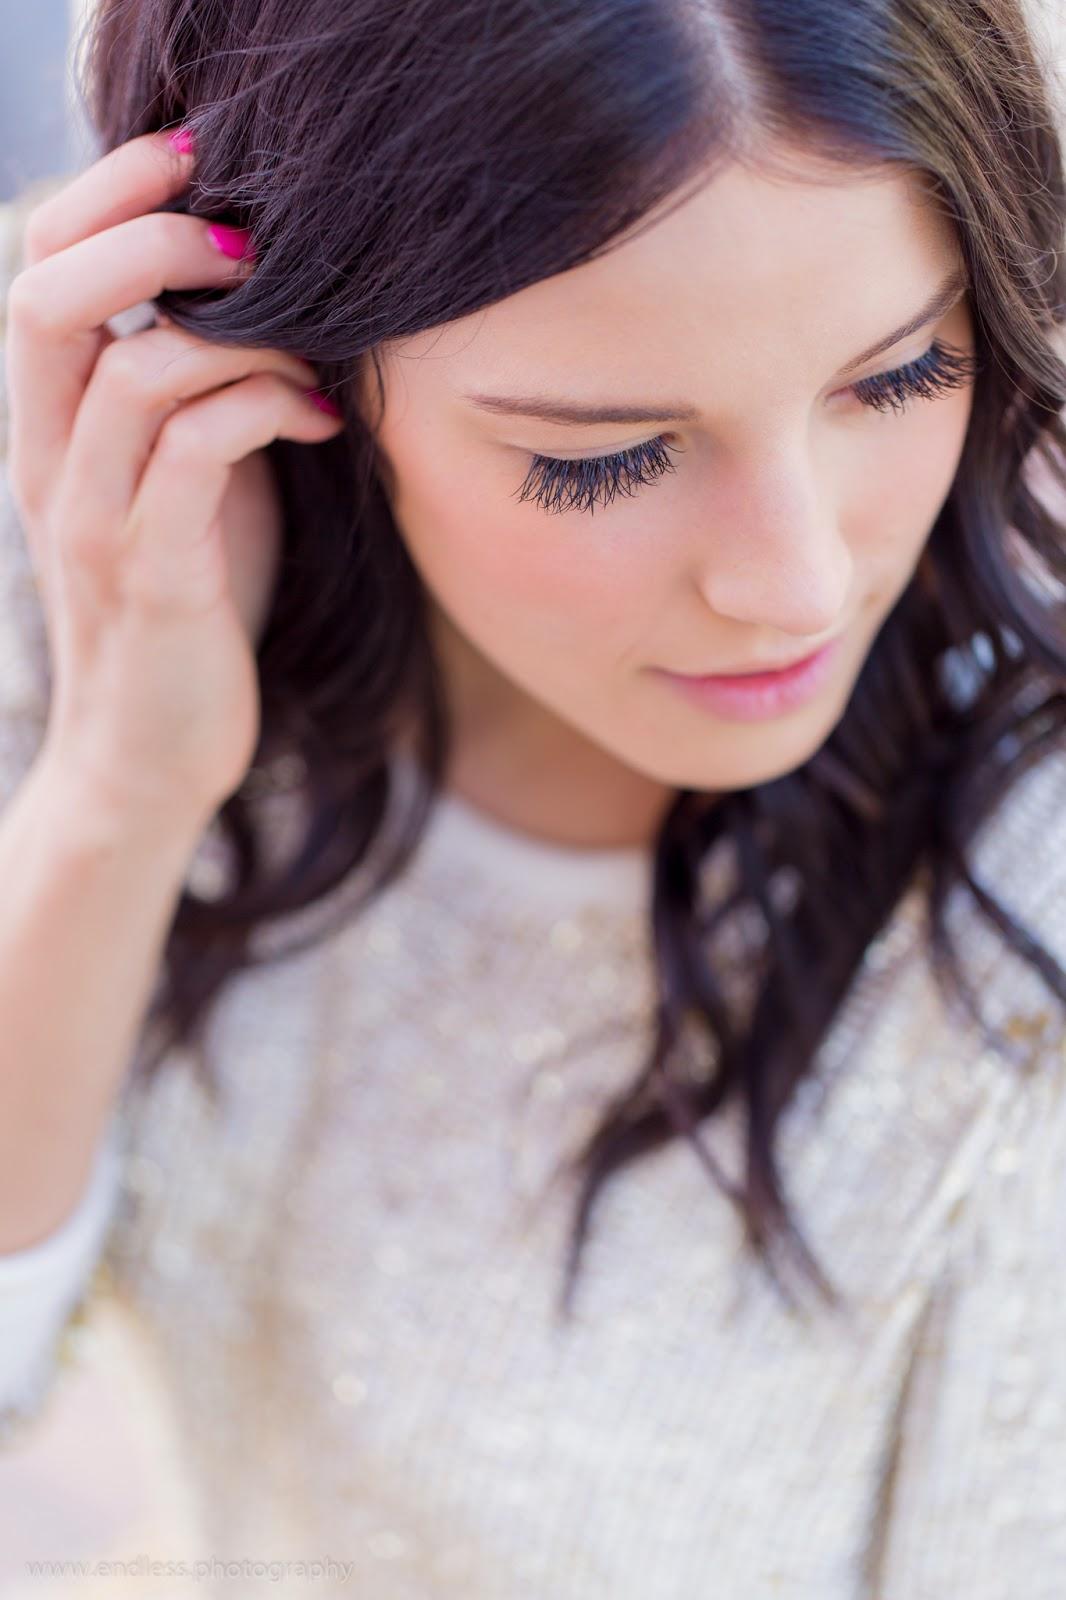 Logan Utah Photographers, Weddings, Commercial, Fashion, Portraits, Model, Designer, Bree Wilkins, BreeLena.com, Endless Photography